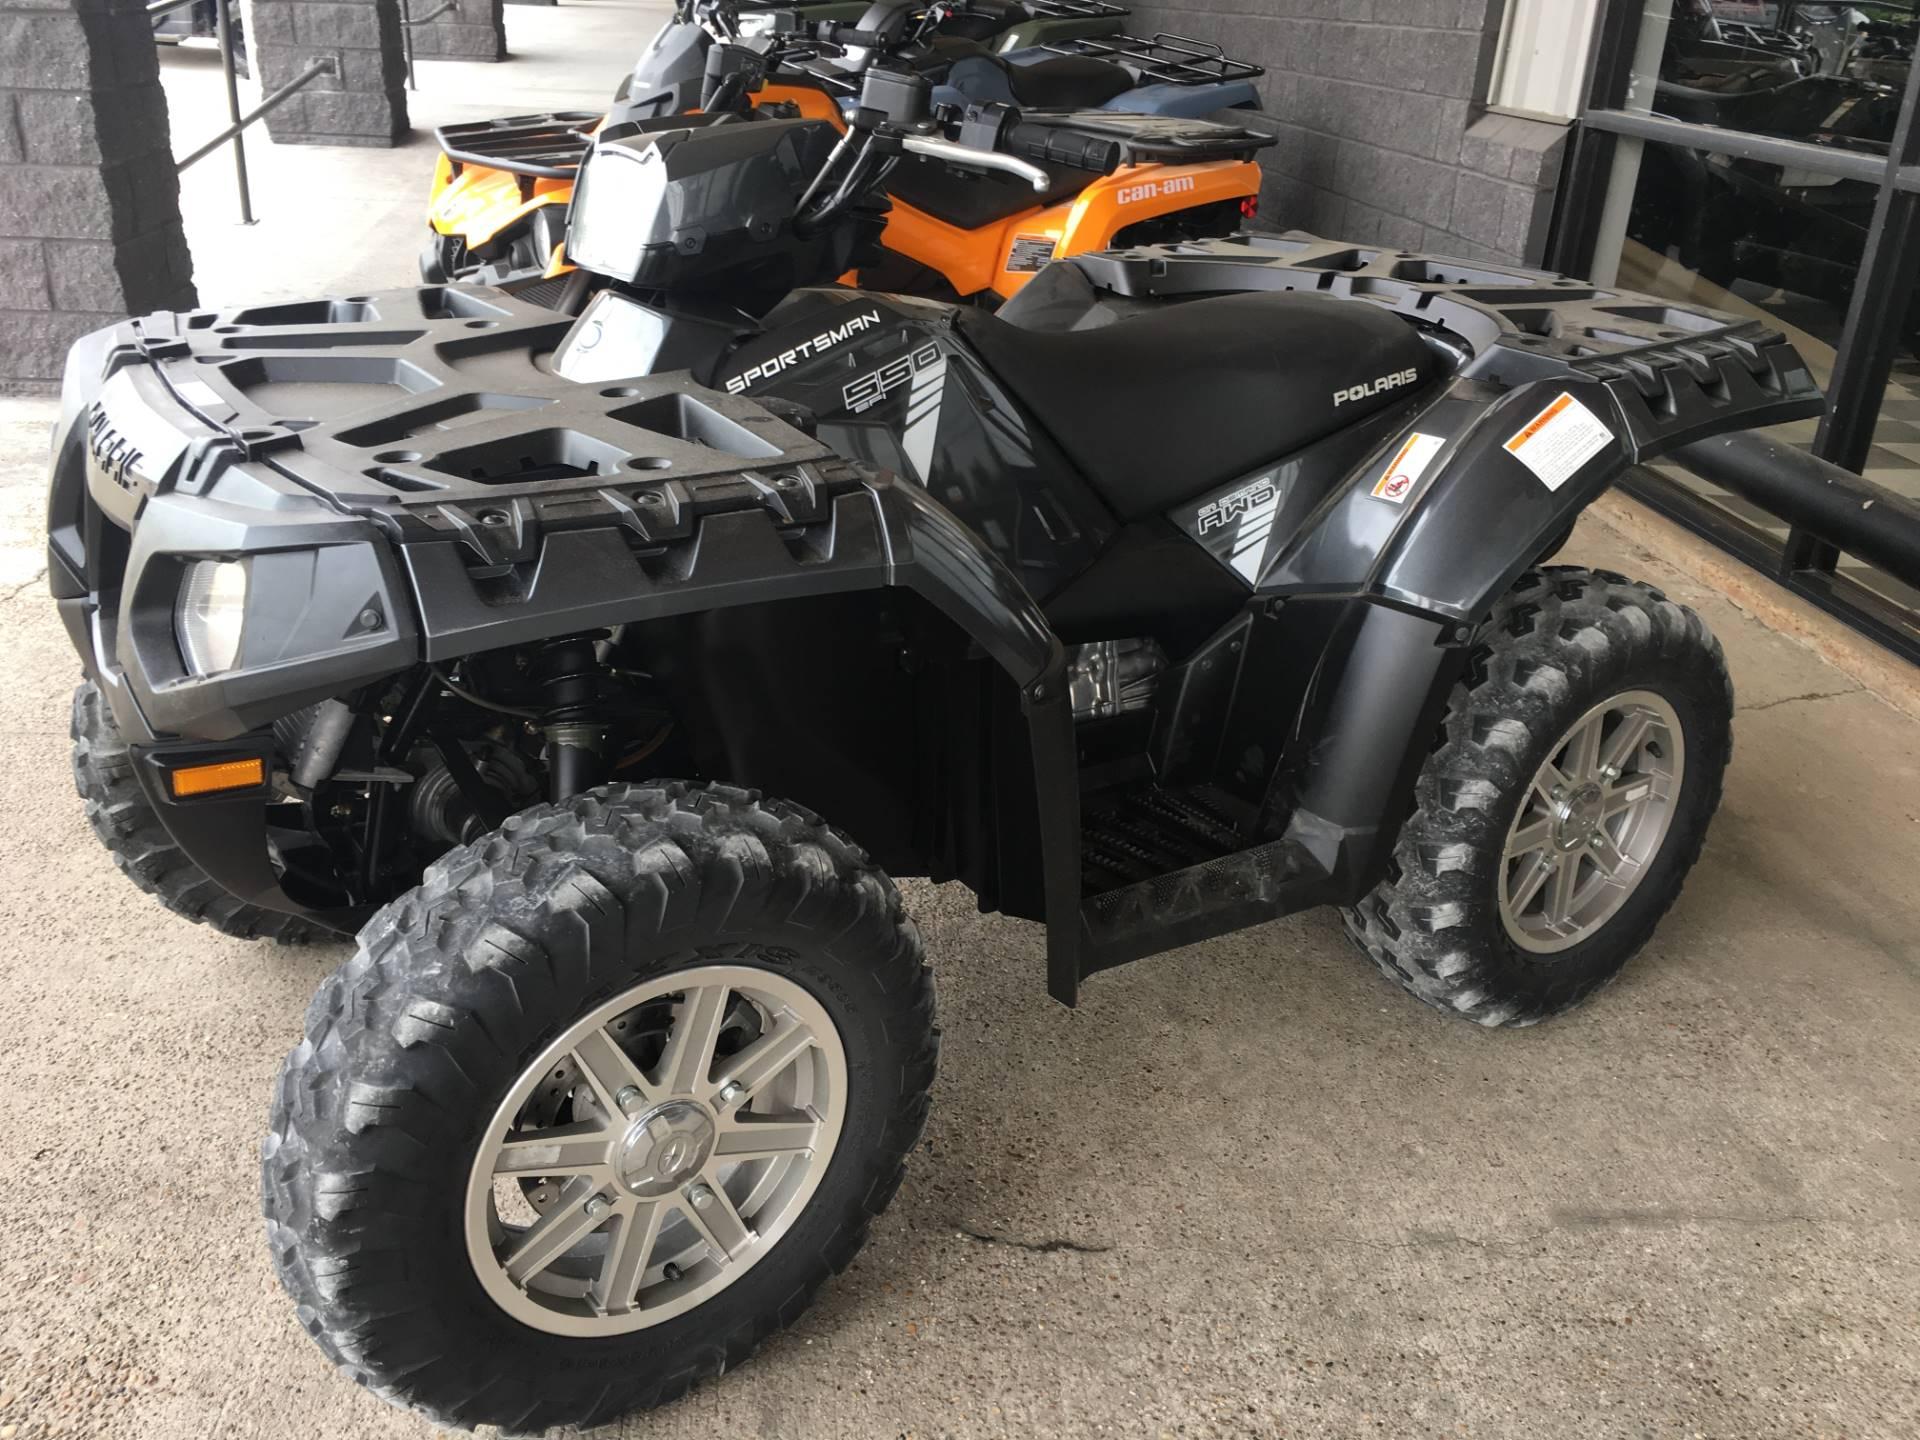 New 2014 Polaris Sportsman® 550 EPS ATVs in Leland, MS | Stock ...